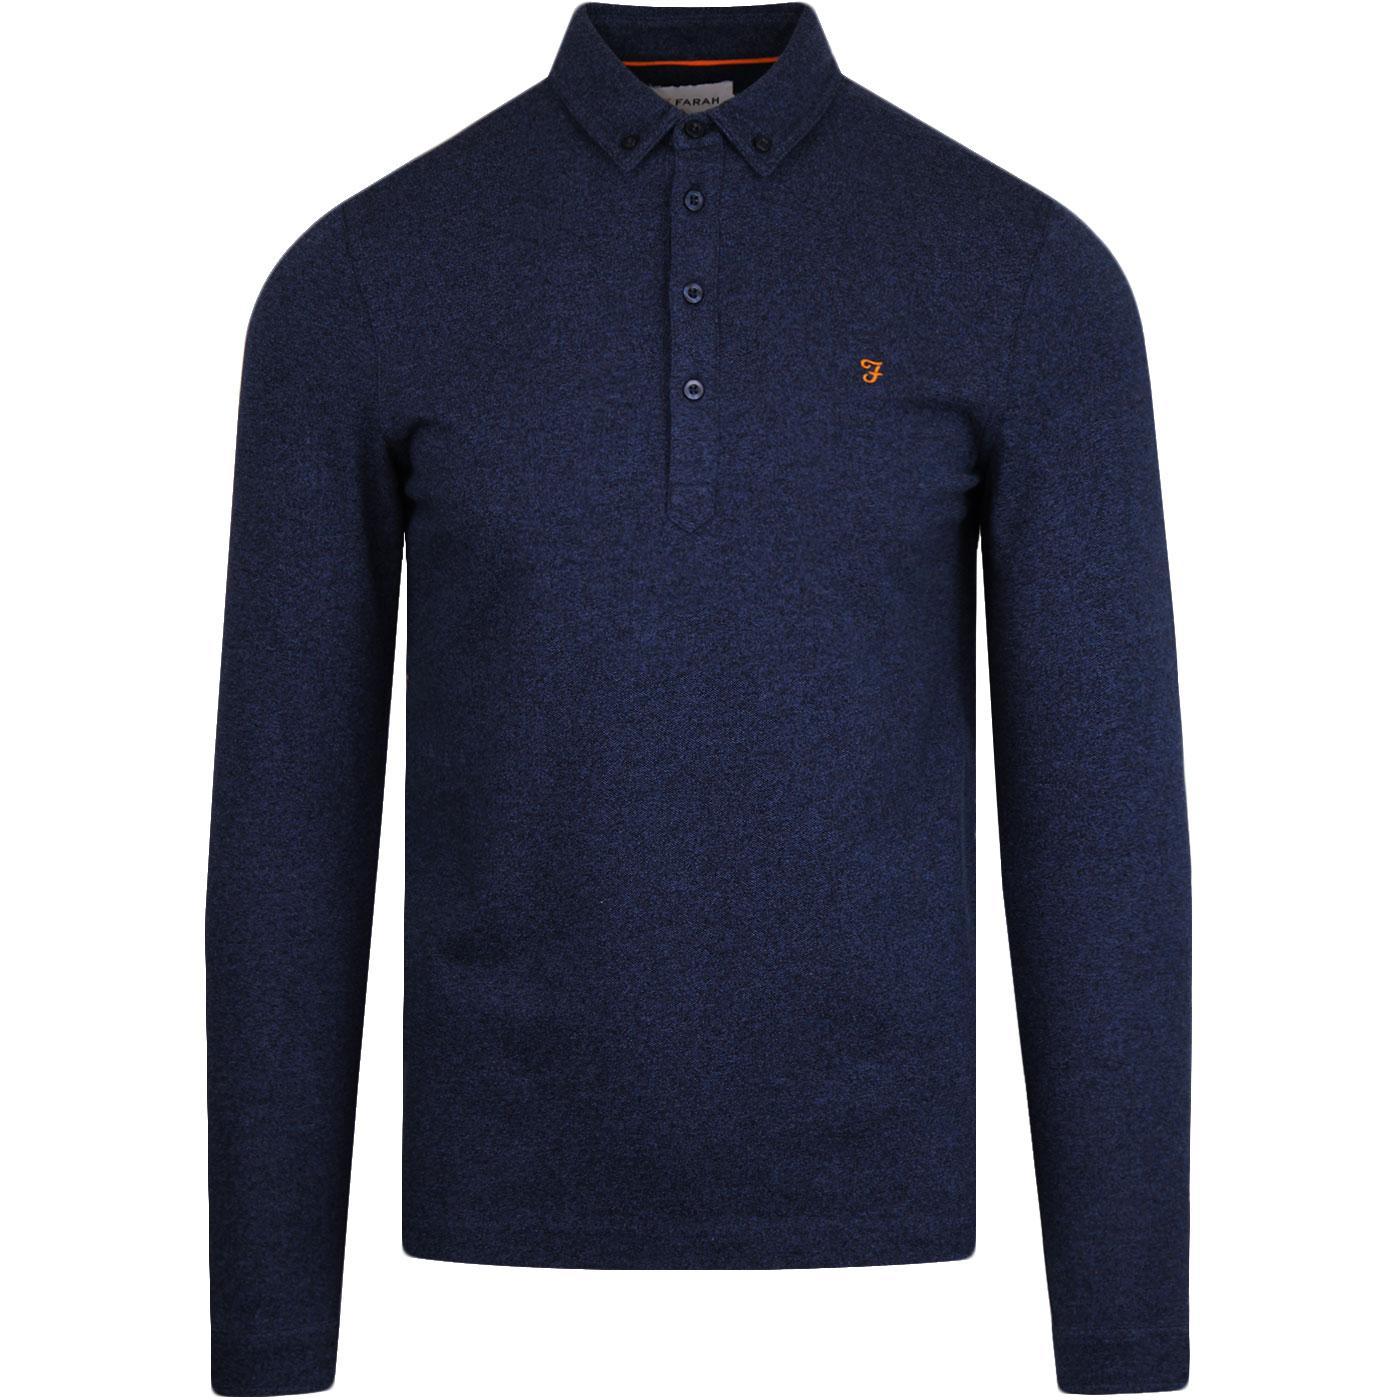 Merriweather FARAH Mod L/S Pique Polo Shirt (NBM)